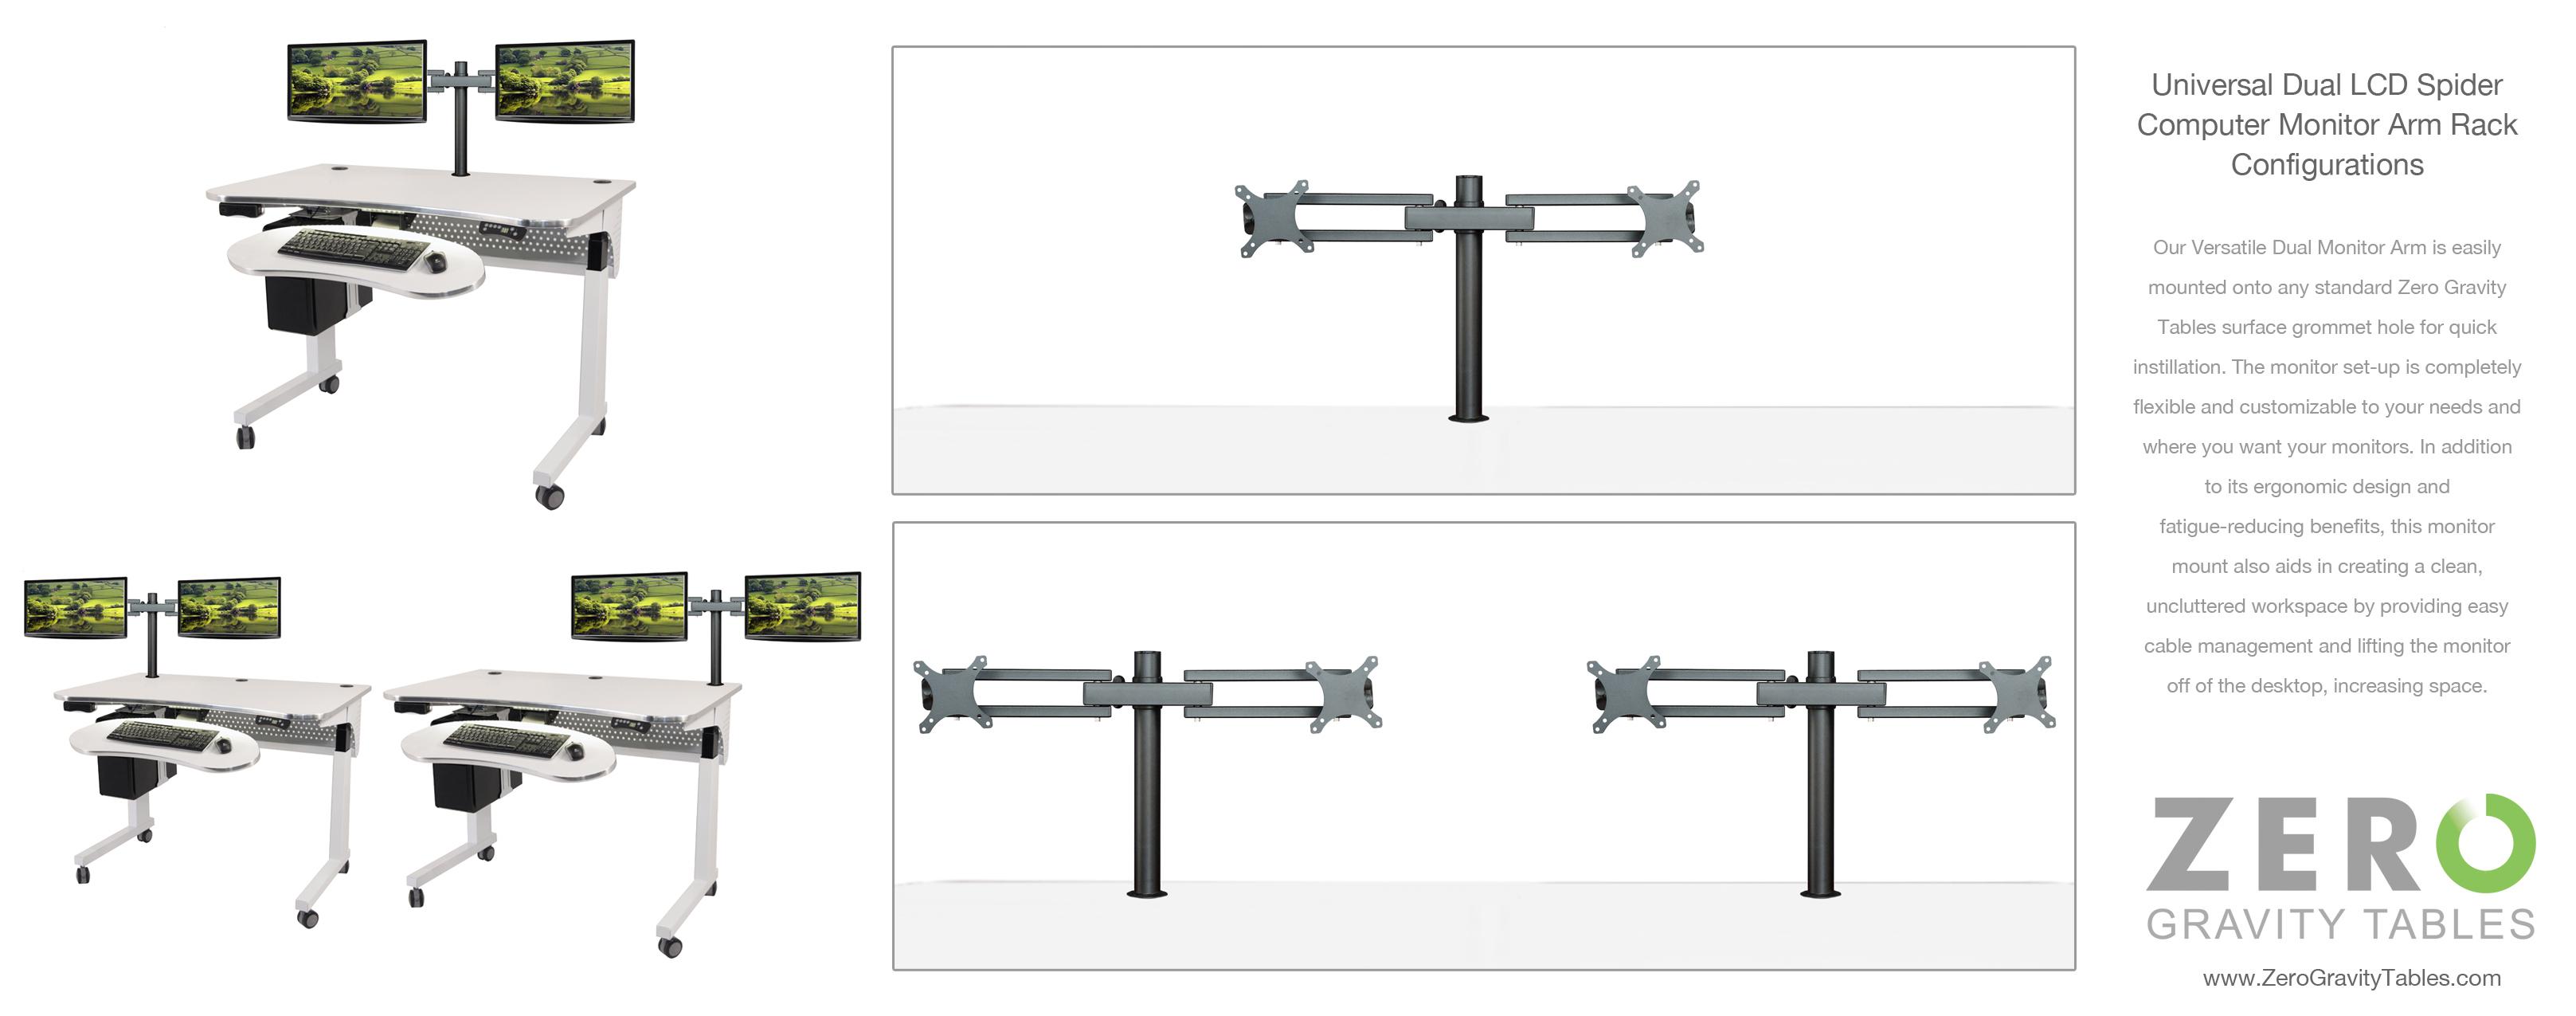 stand-sit-height-adjustable-electric-lift-standing-desk-dual-spider-monitor-racks-left-set-up-setup-2.jpg